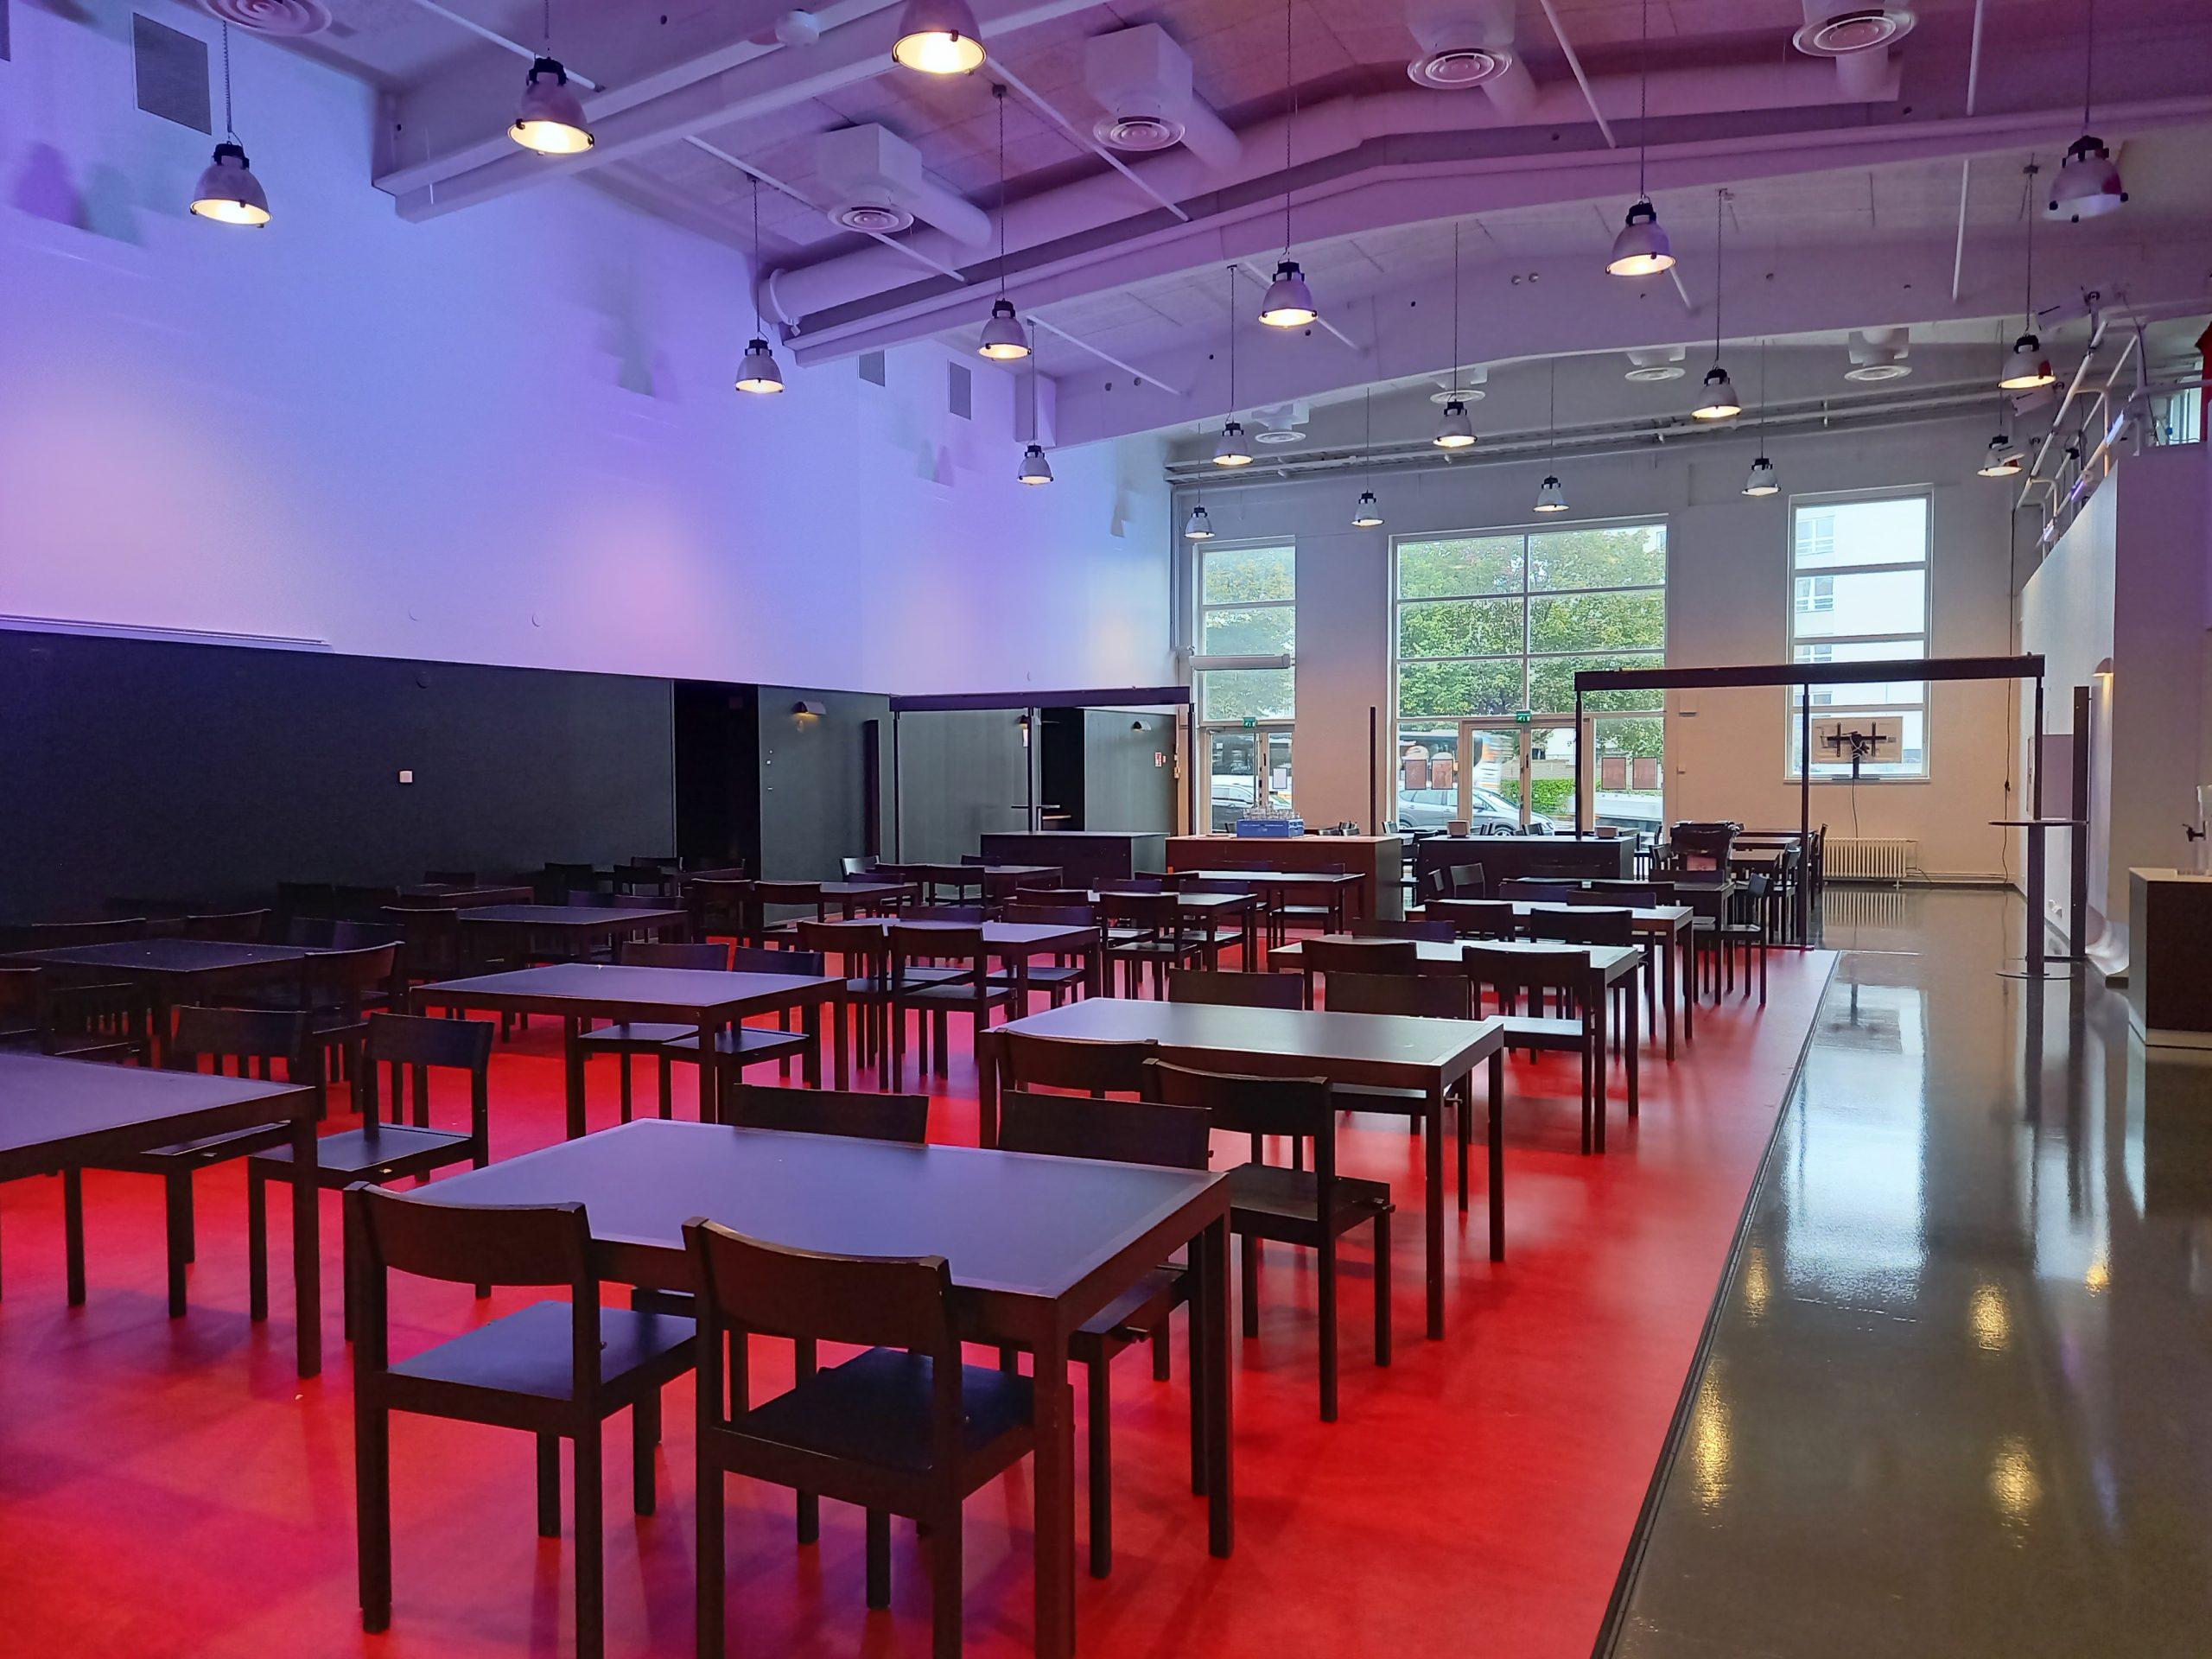 Teatteriravintola © Oskari Raunio  Verkatehdas 2021 (2)